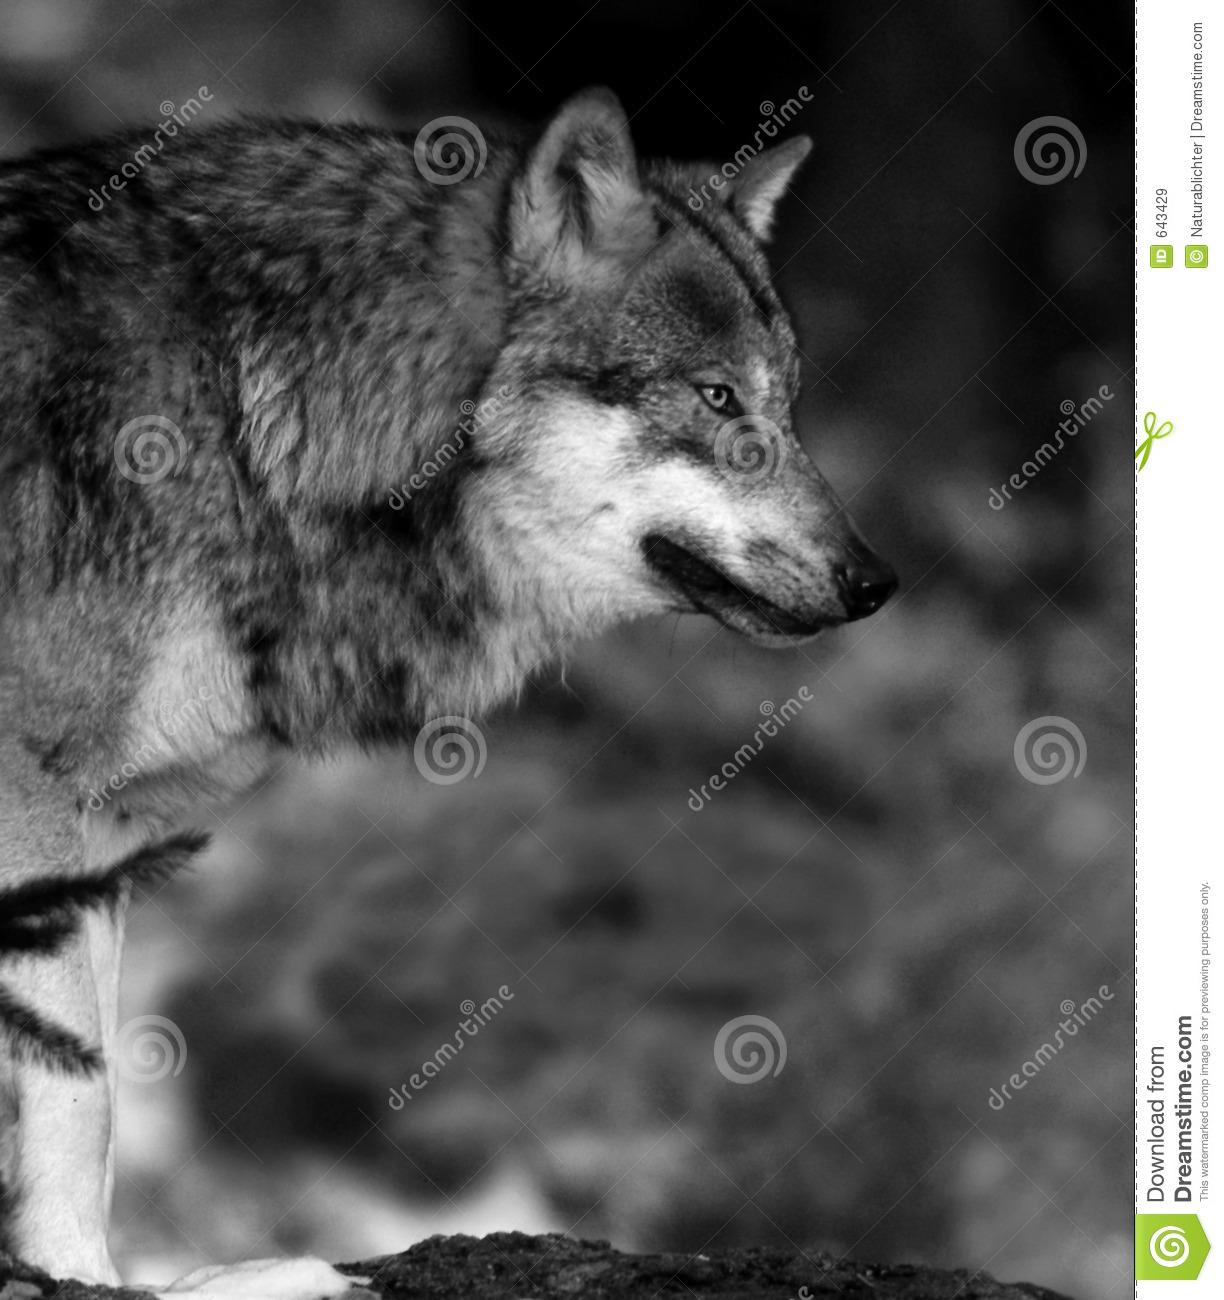 White Wolf : Stunning Photographs Showcase the Beauty of ...